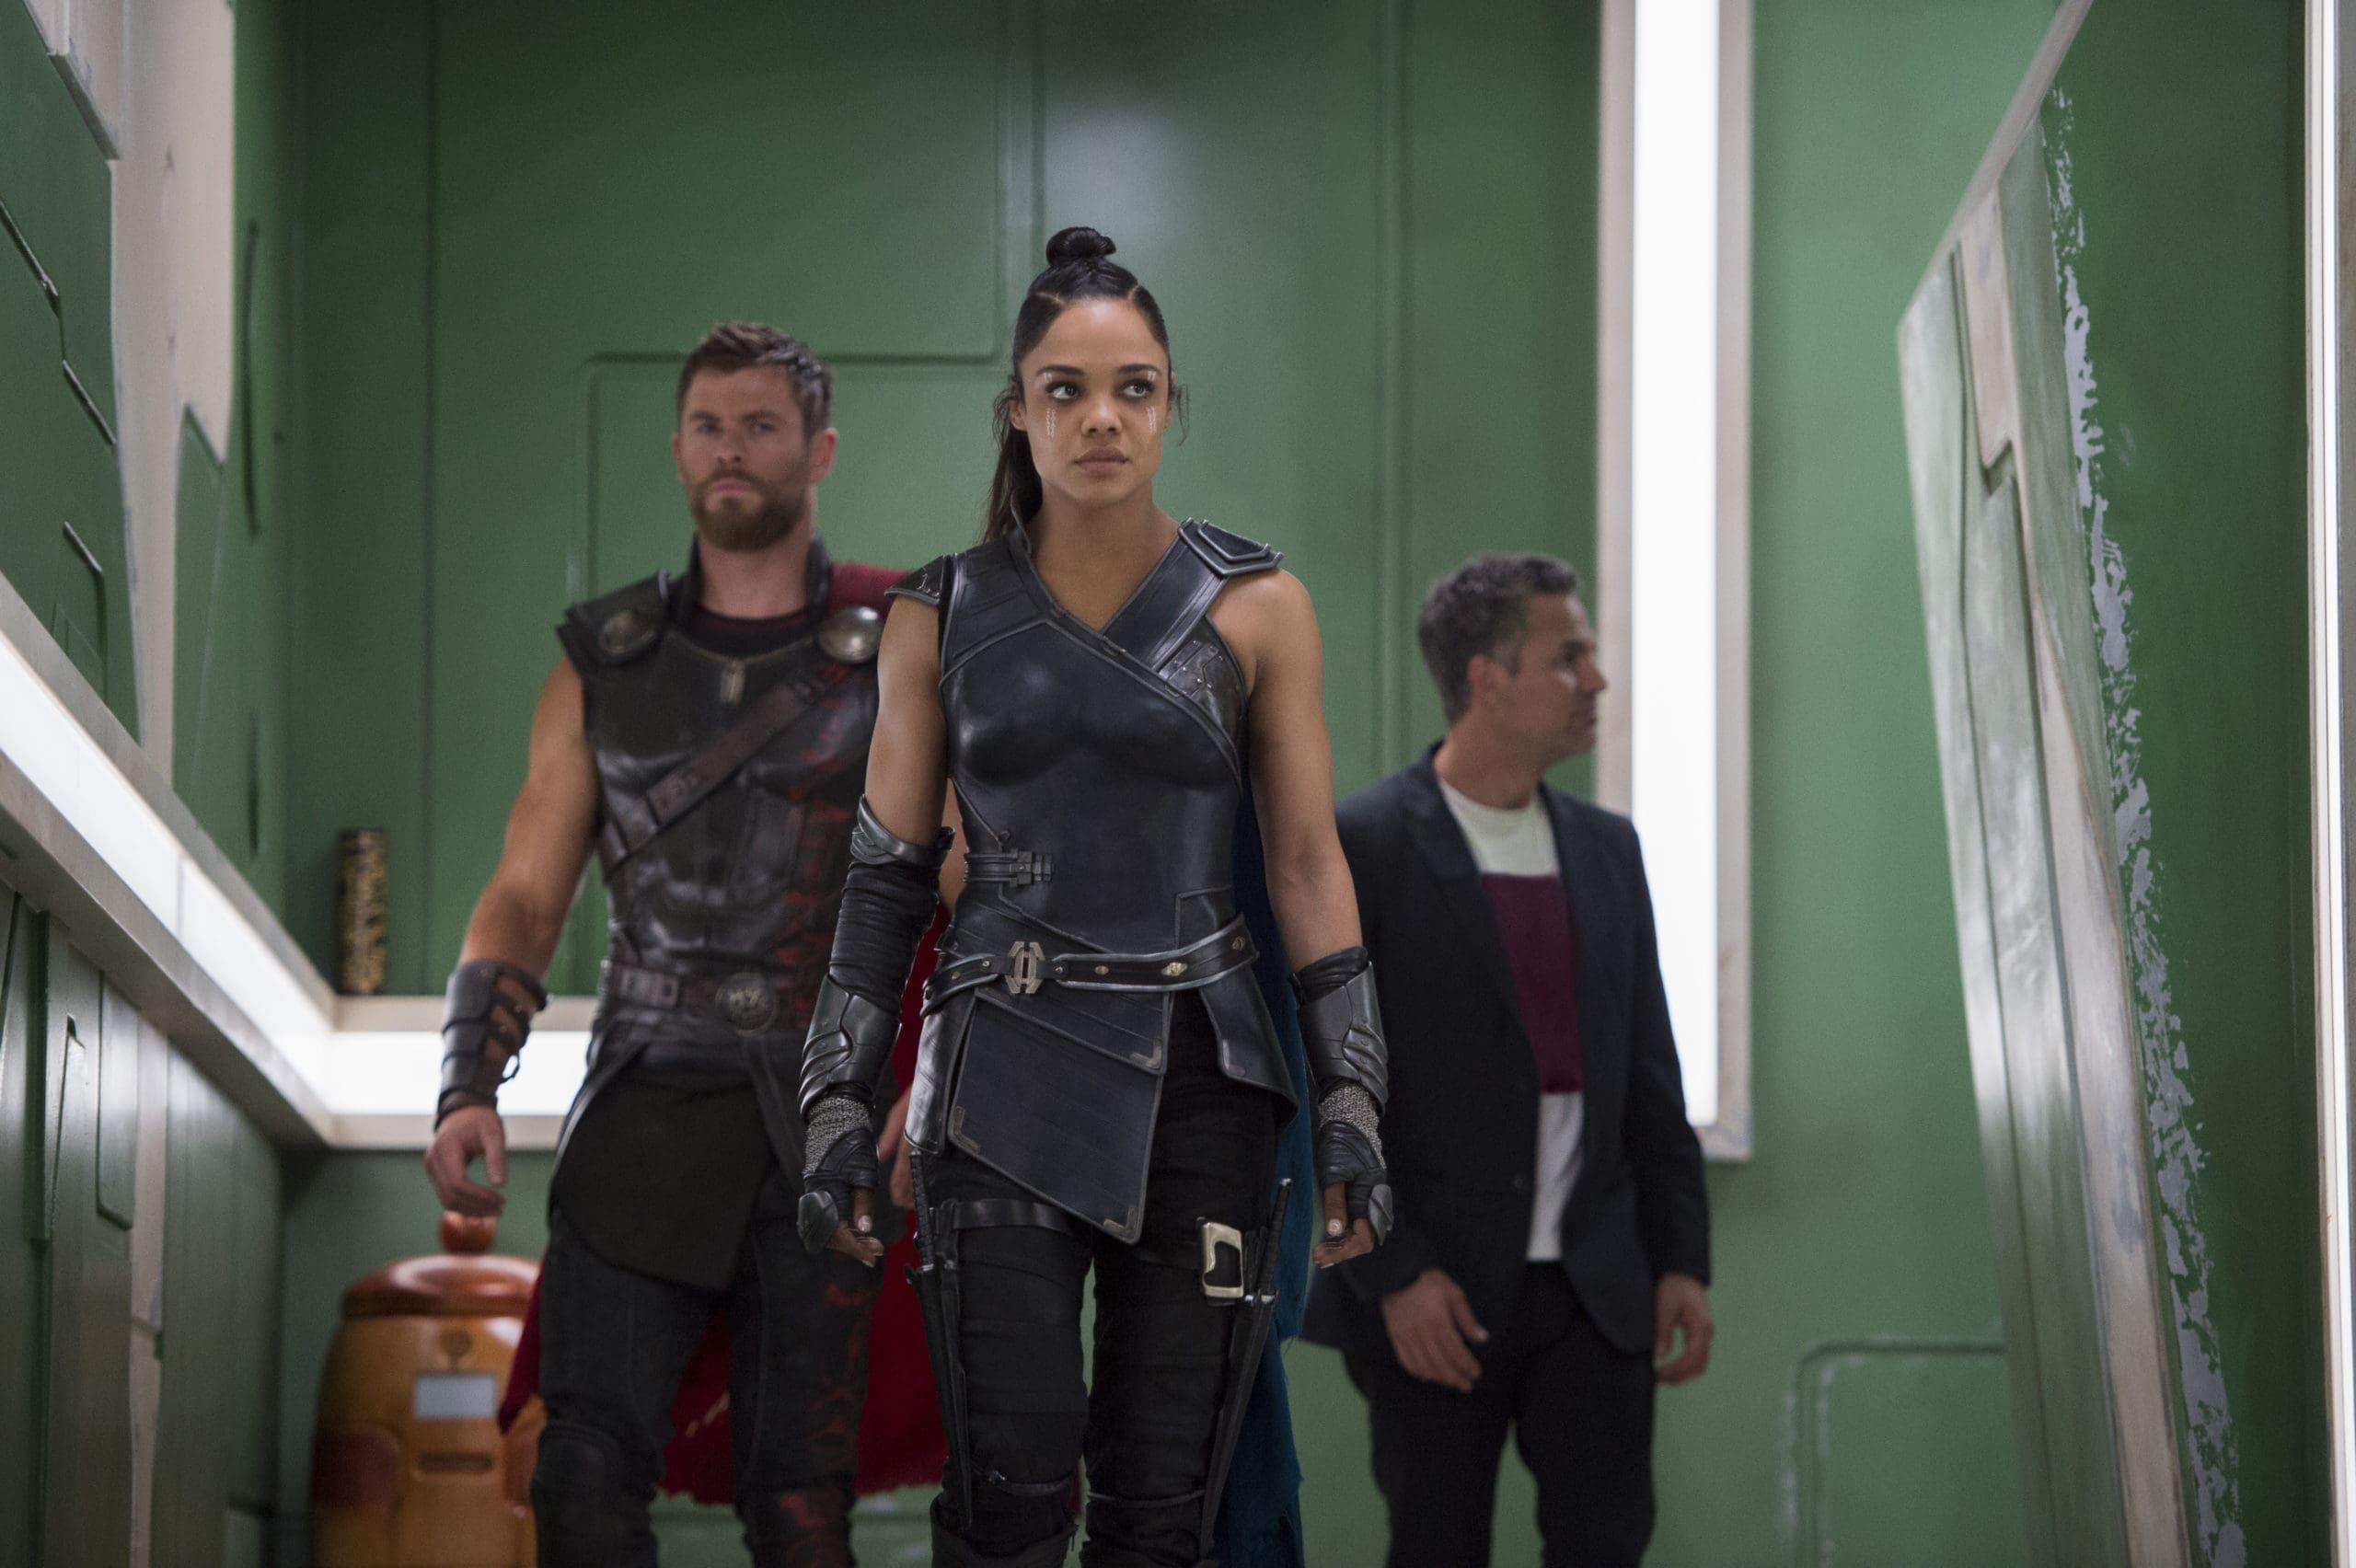 Marvel Studios' THOR: RAGNAROK..L to R: Thor (Chris Hemsworth), Valkyrie (Tessa Thompson) and Bruce Banner/Hulk (Mark Ruffalo)..Ph: Jasin Boland..©Marvel Studios 2017